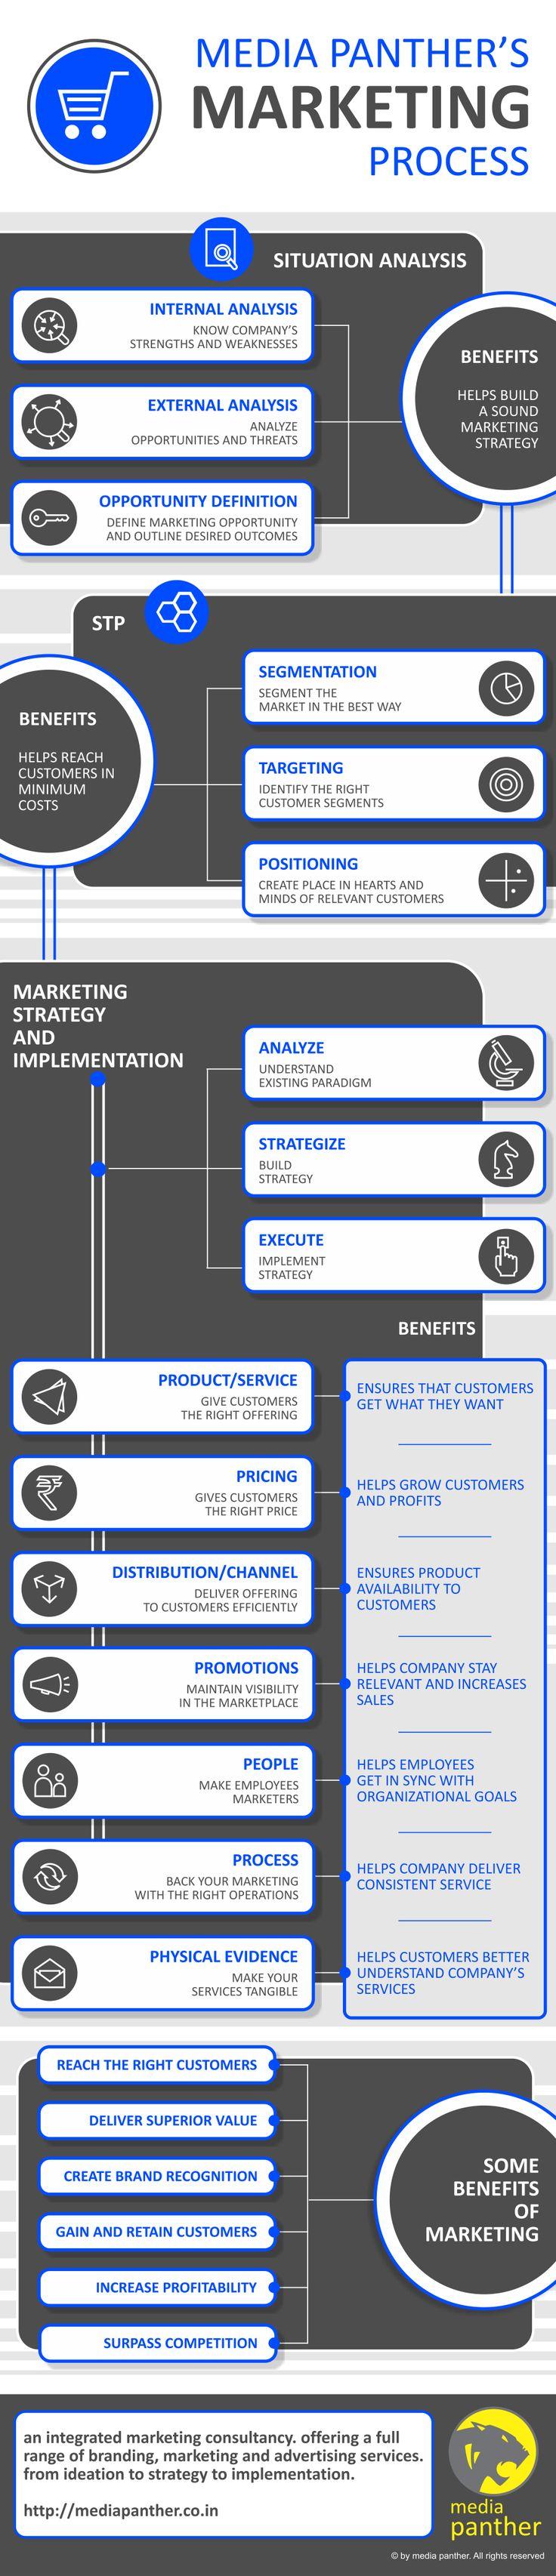 Media Panther's Marketing Process #digitalmarketing